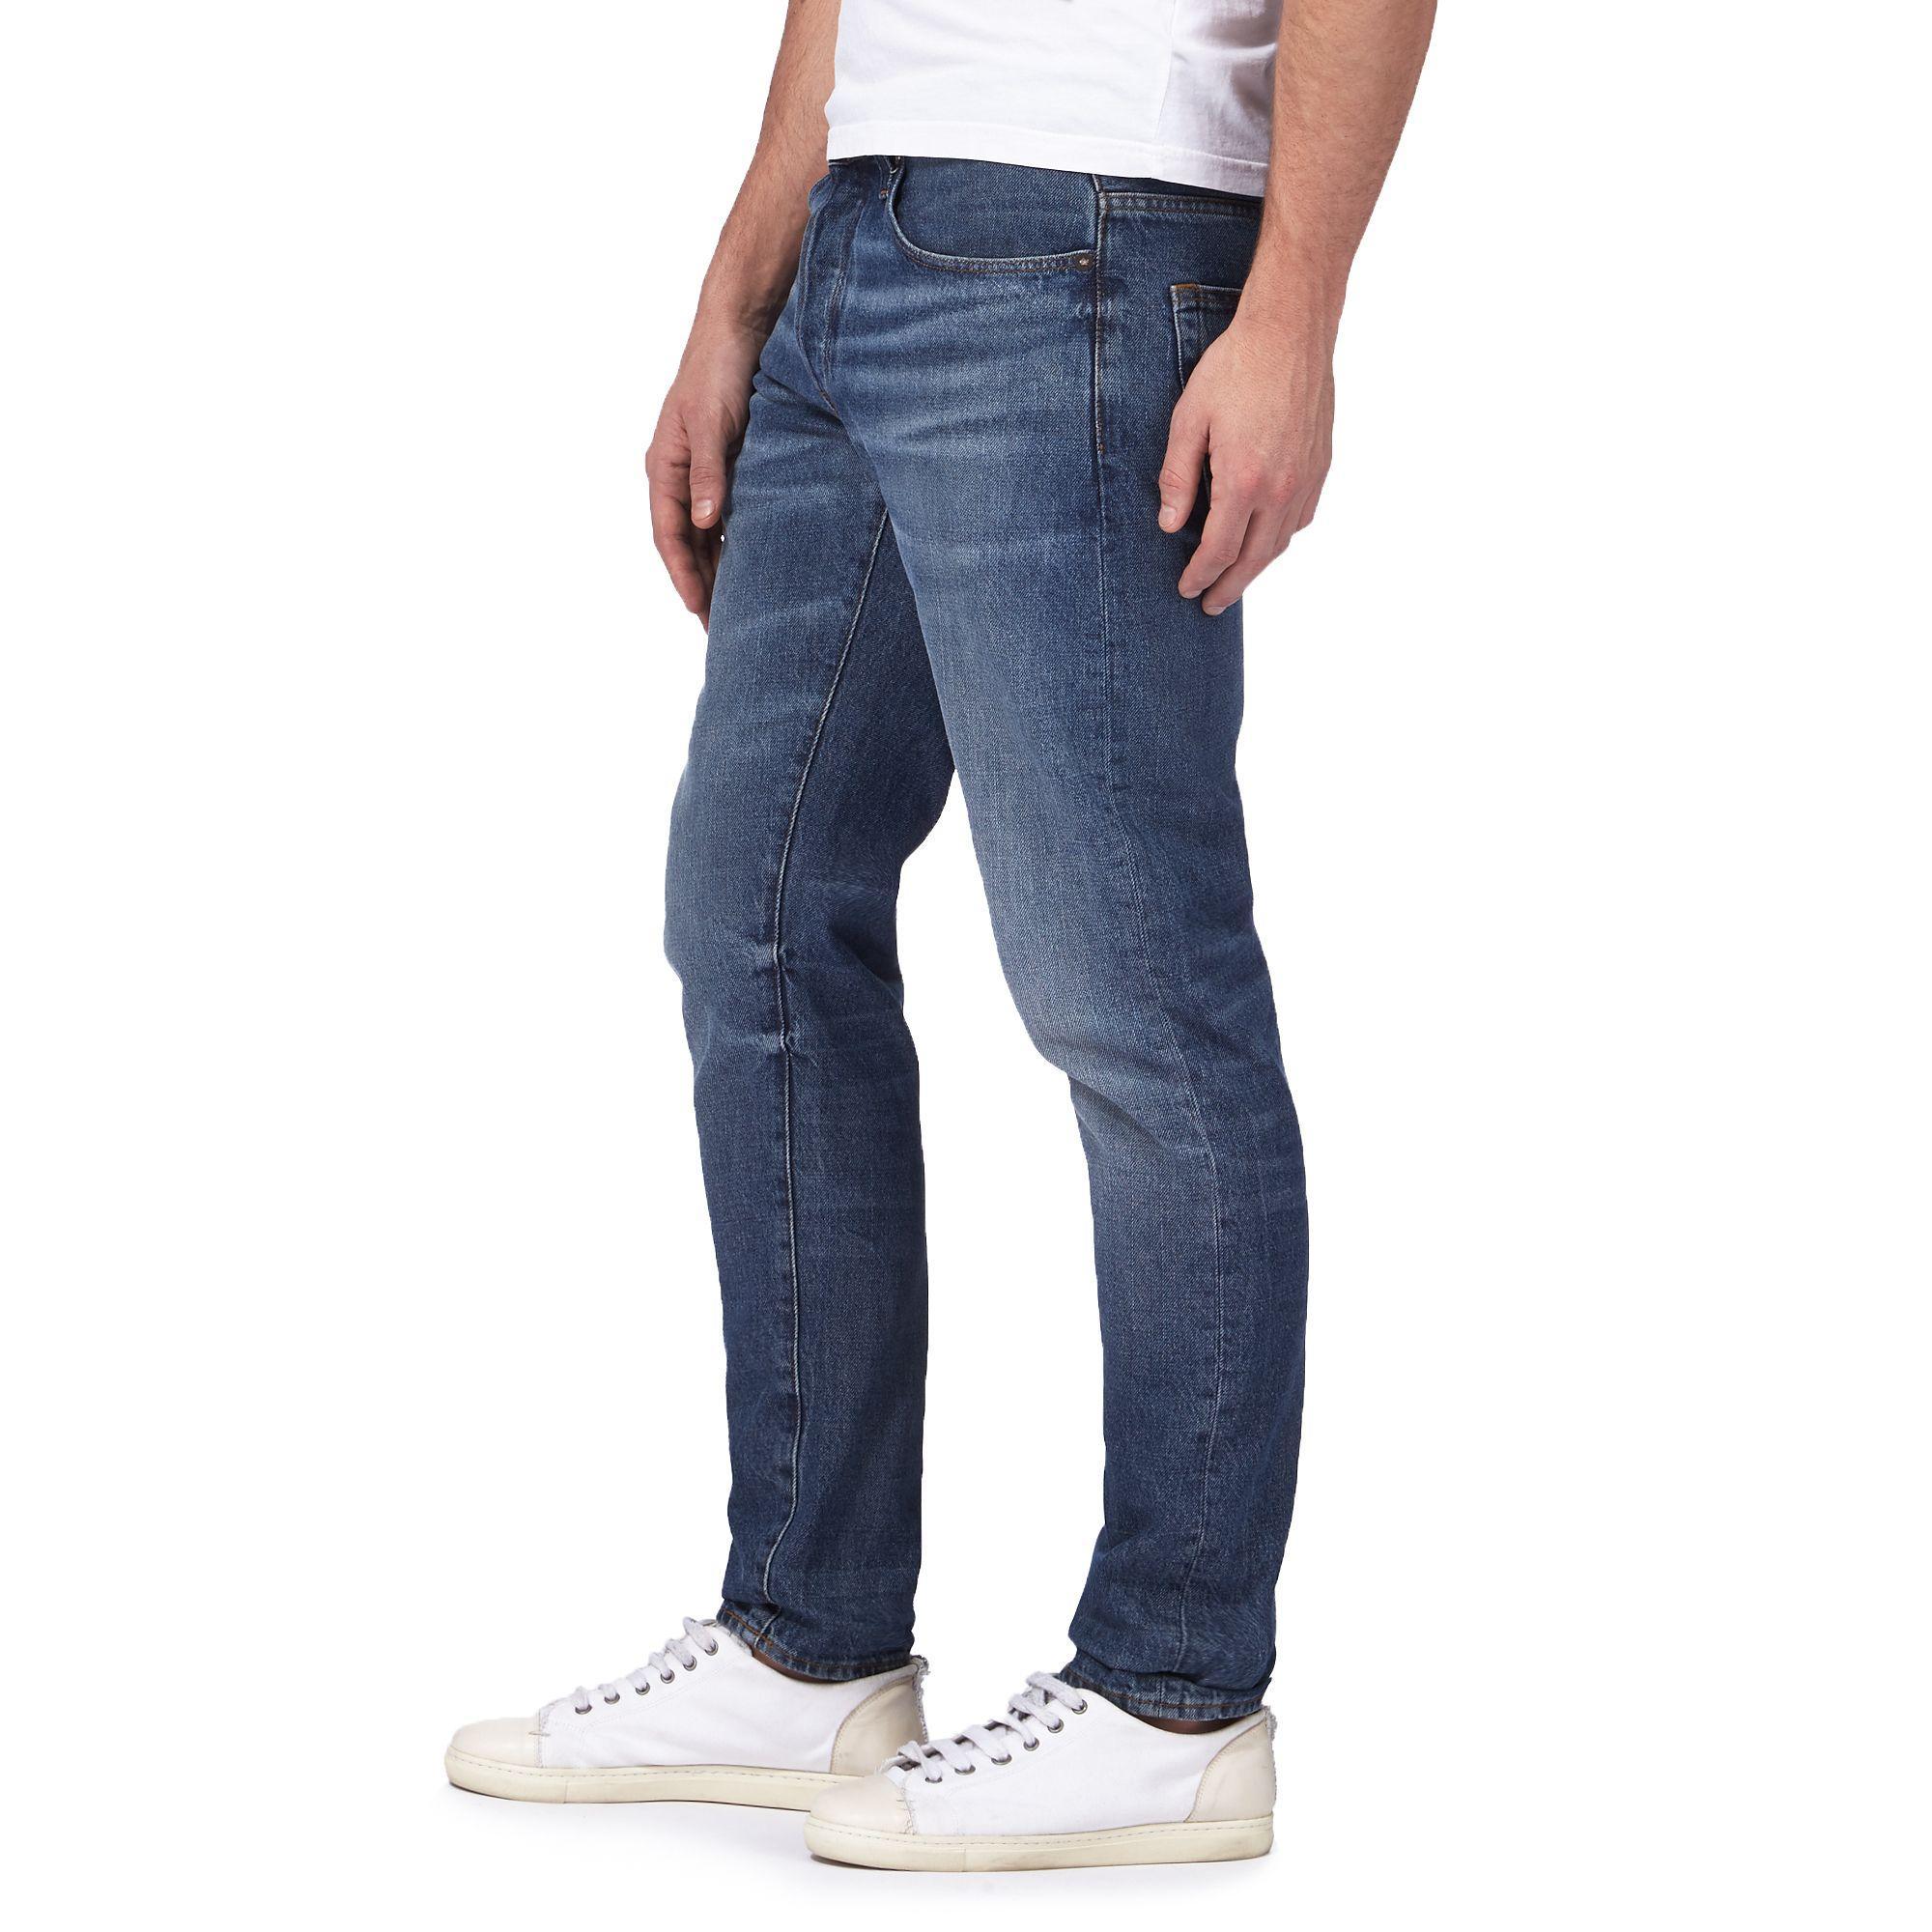 Blue Wash G For Slim Mid In Lyst Men Star Fit Raw Jeans qIq6EU